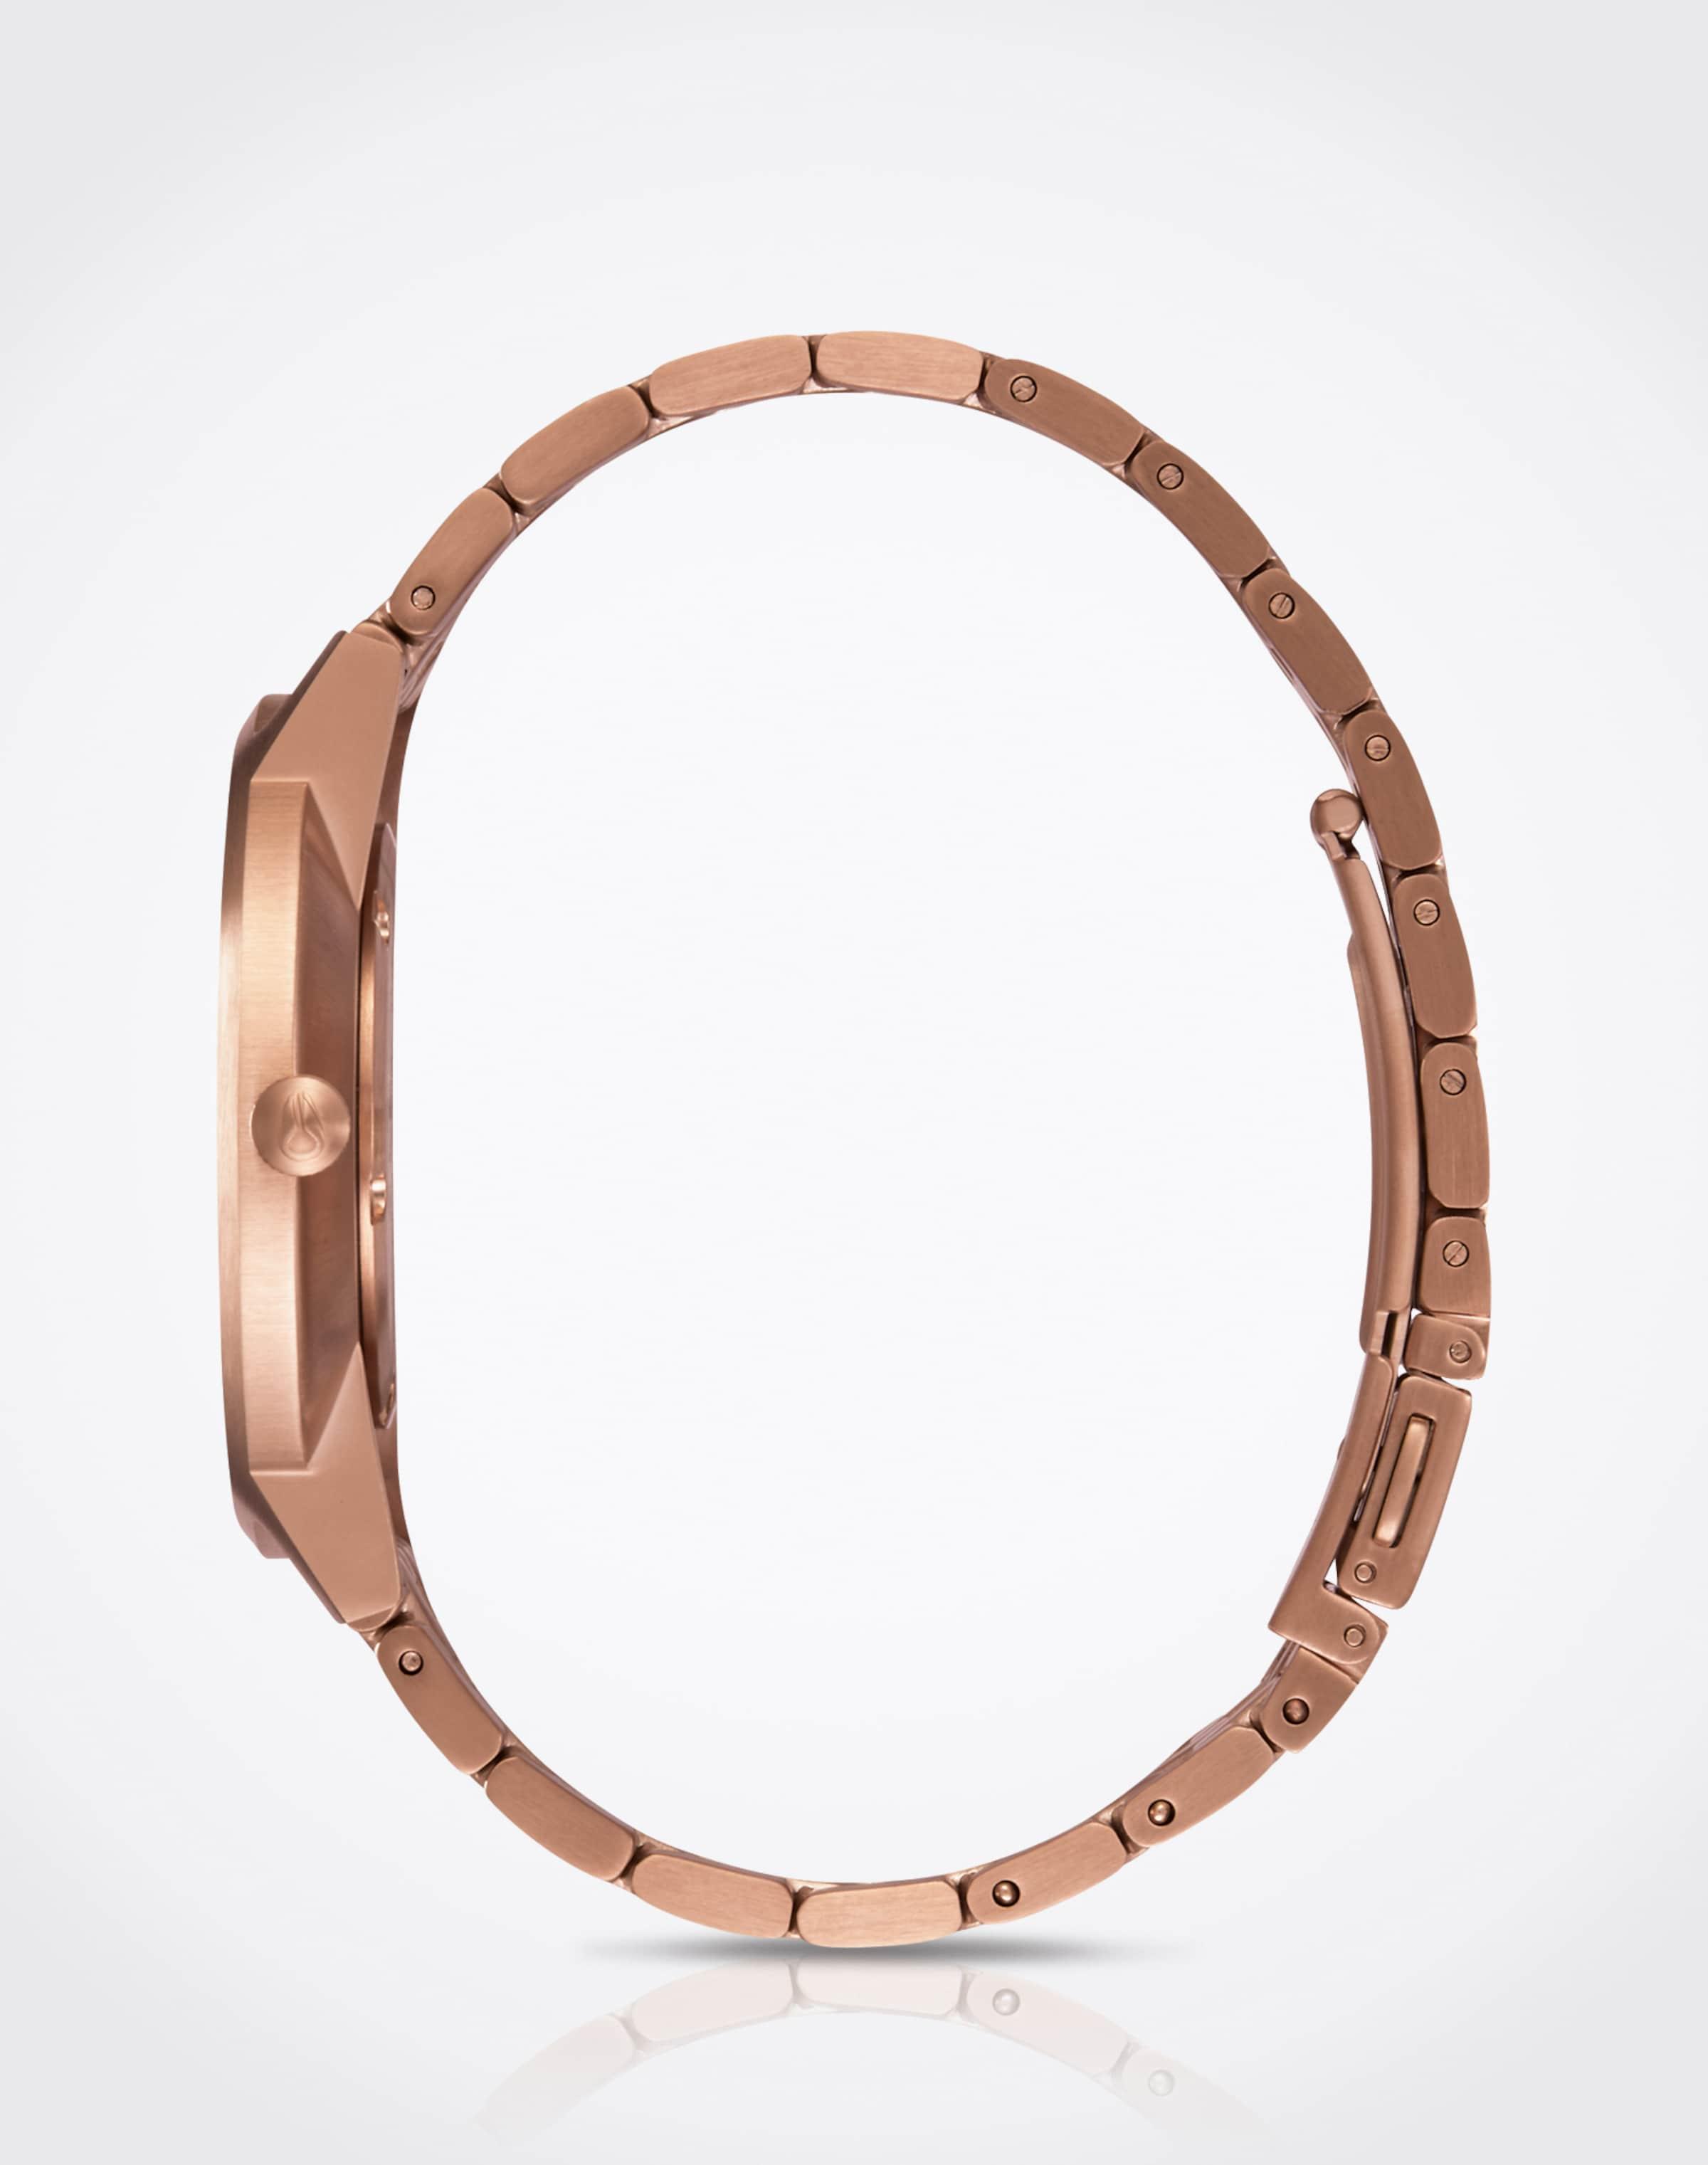 Nixon Armbanduhr 'Porter' (Gehäusedurchmesser: 40mm) Rabatt Fälschung 2018 Neue Rabatt Top-Qualität Geniue Händler Günstiger Preis Hohe Qualität Günstiger Preis kAgeUyYQS